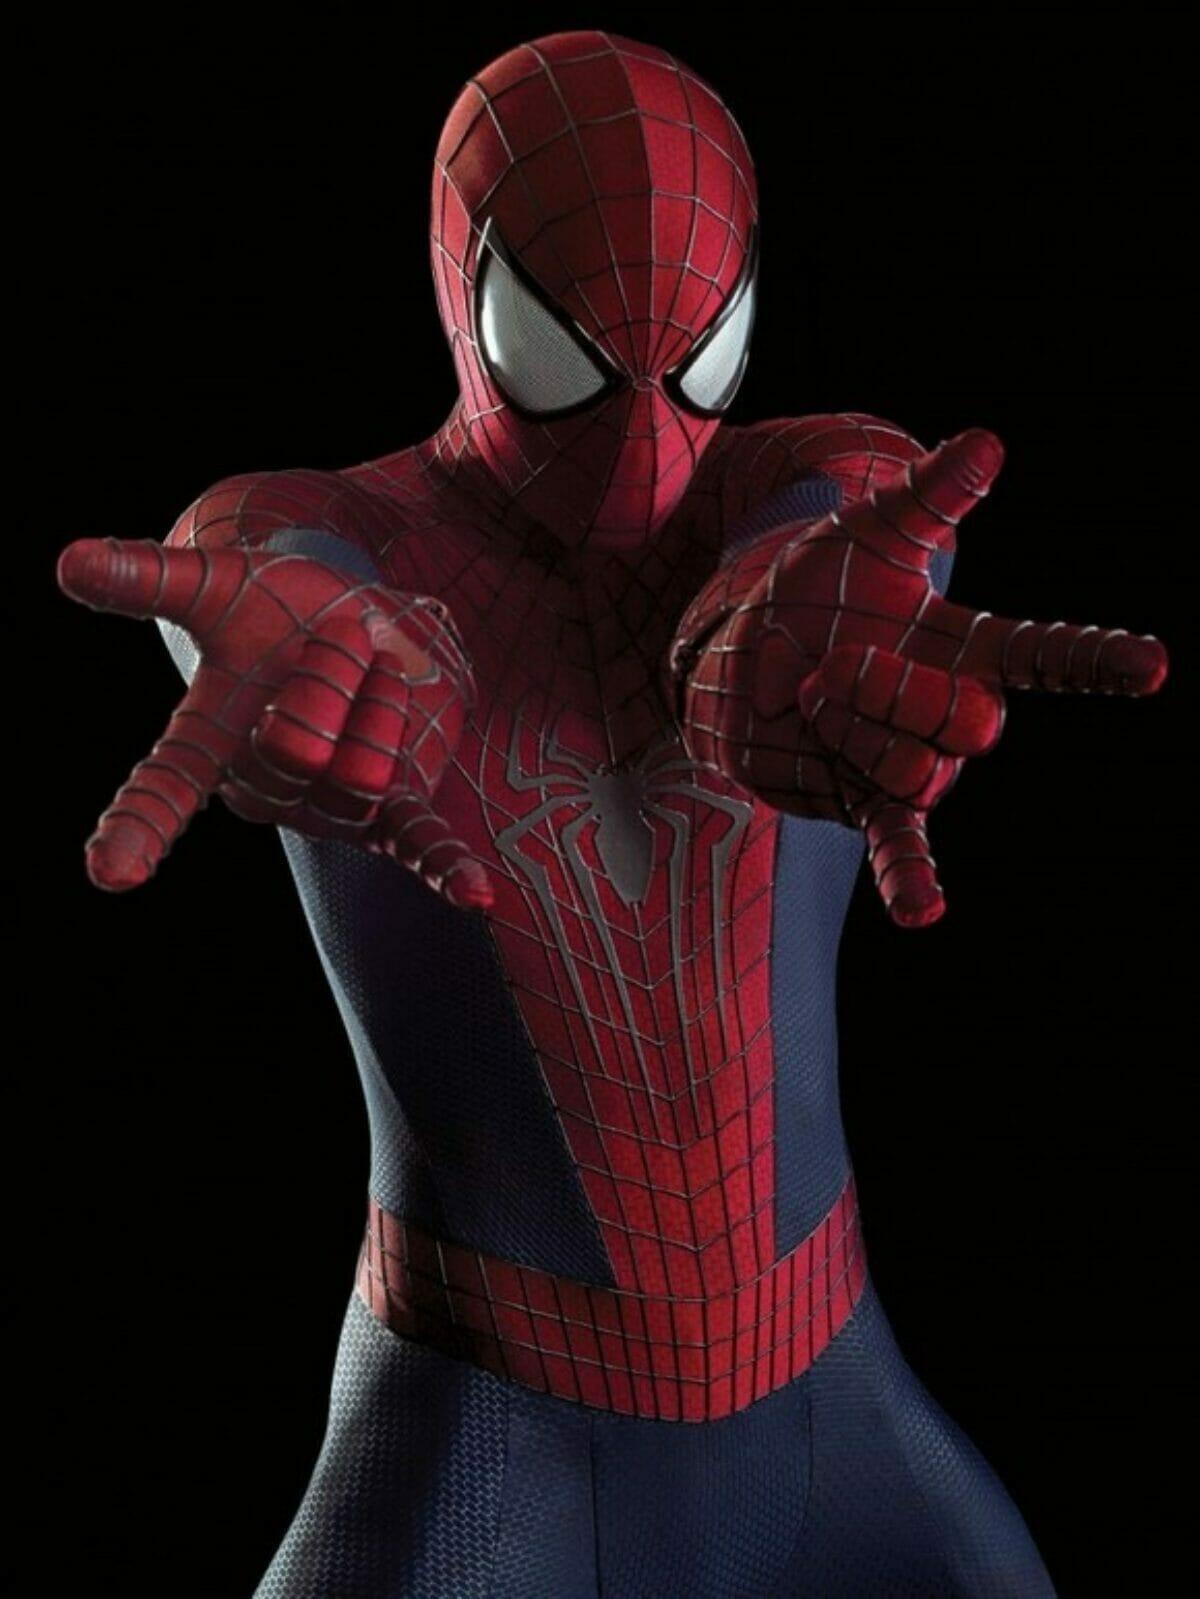 The-Amazing-spider-man-2-electro